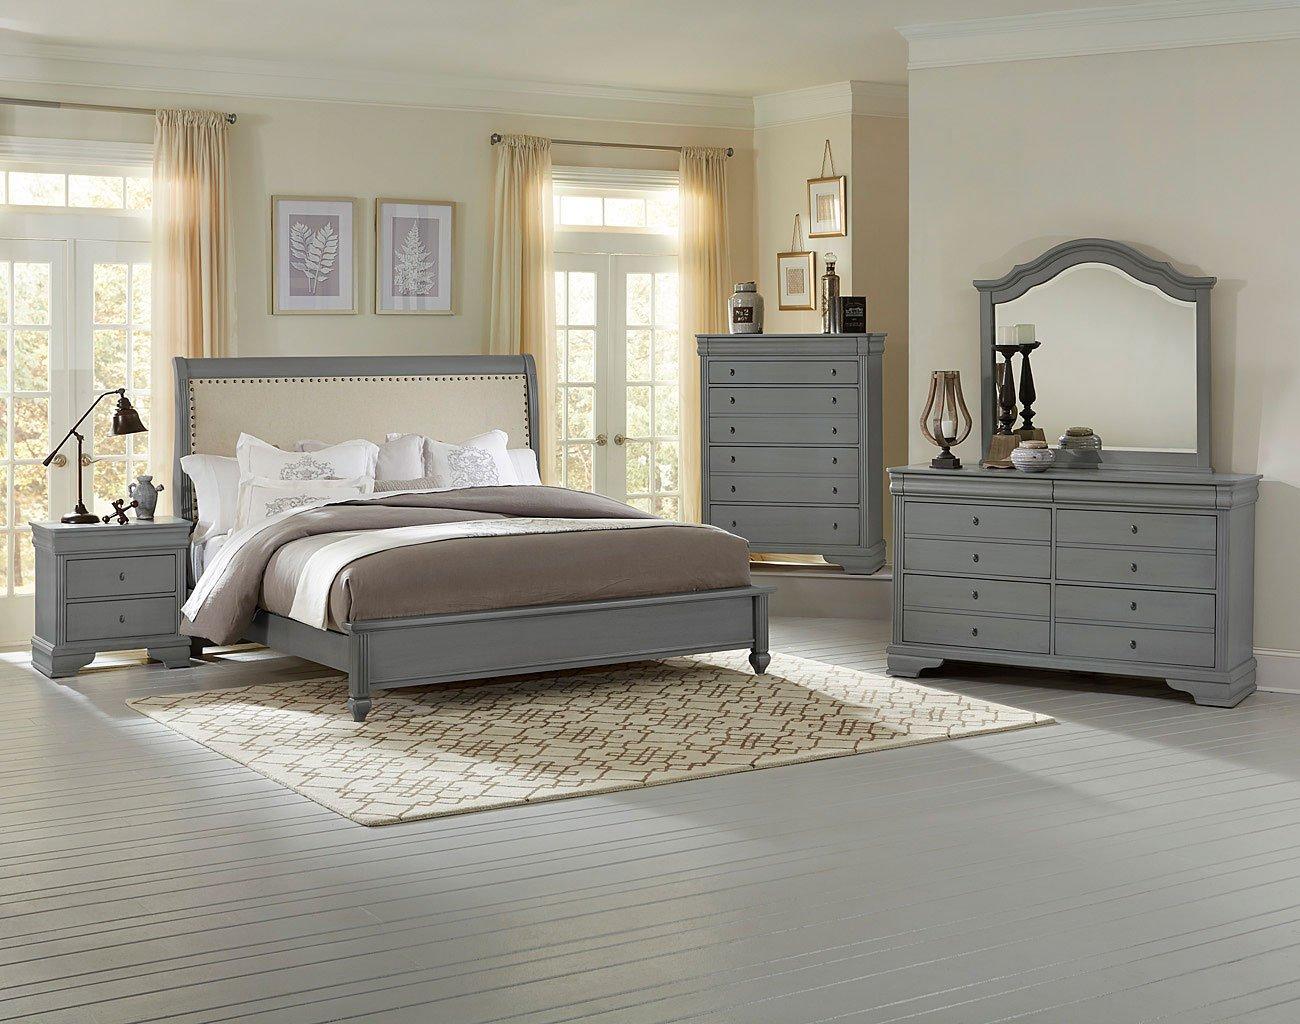 French Market Upholstered Bedroom Set Zinc Vaughan Bett 1 Reviews Furniture Cart